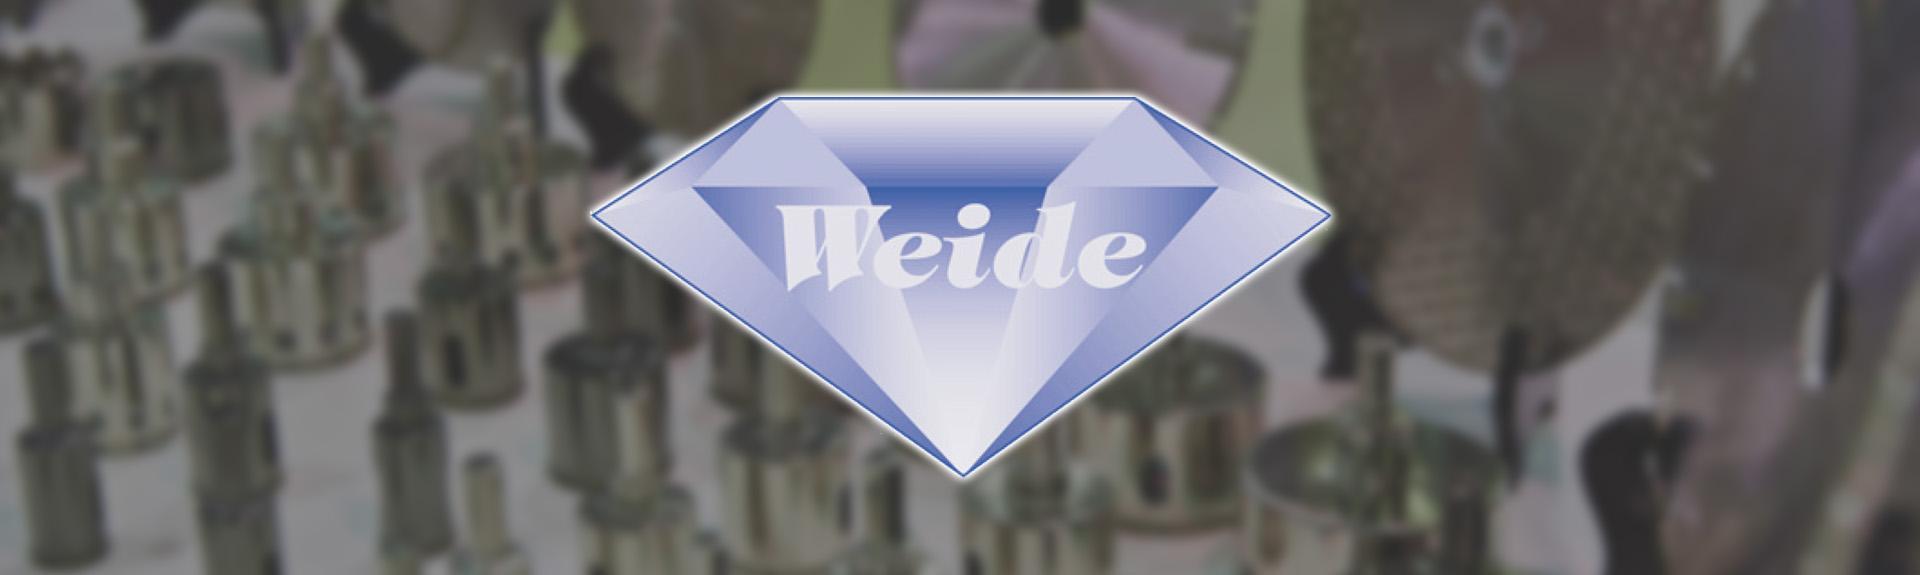 Weide diamantværktøj banner